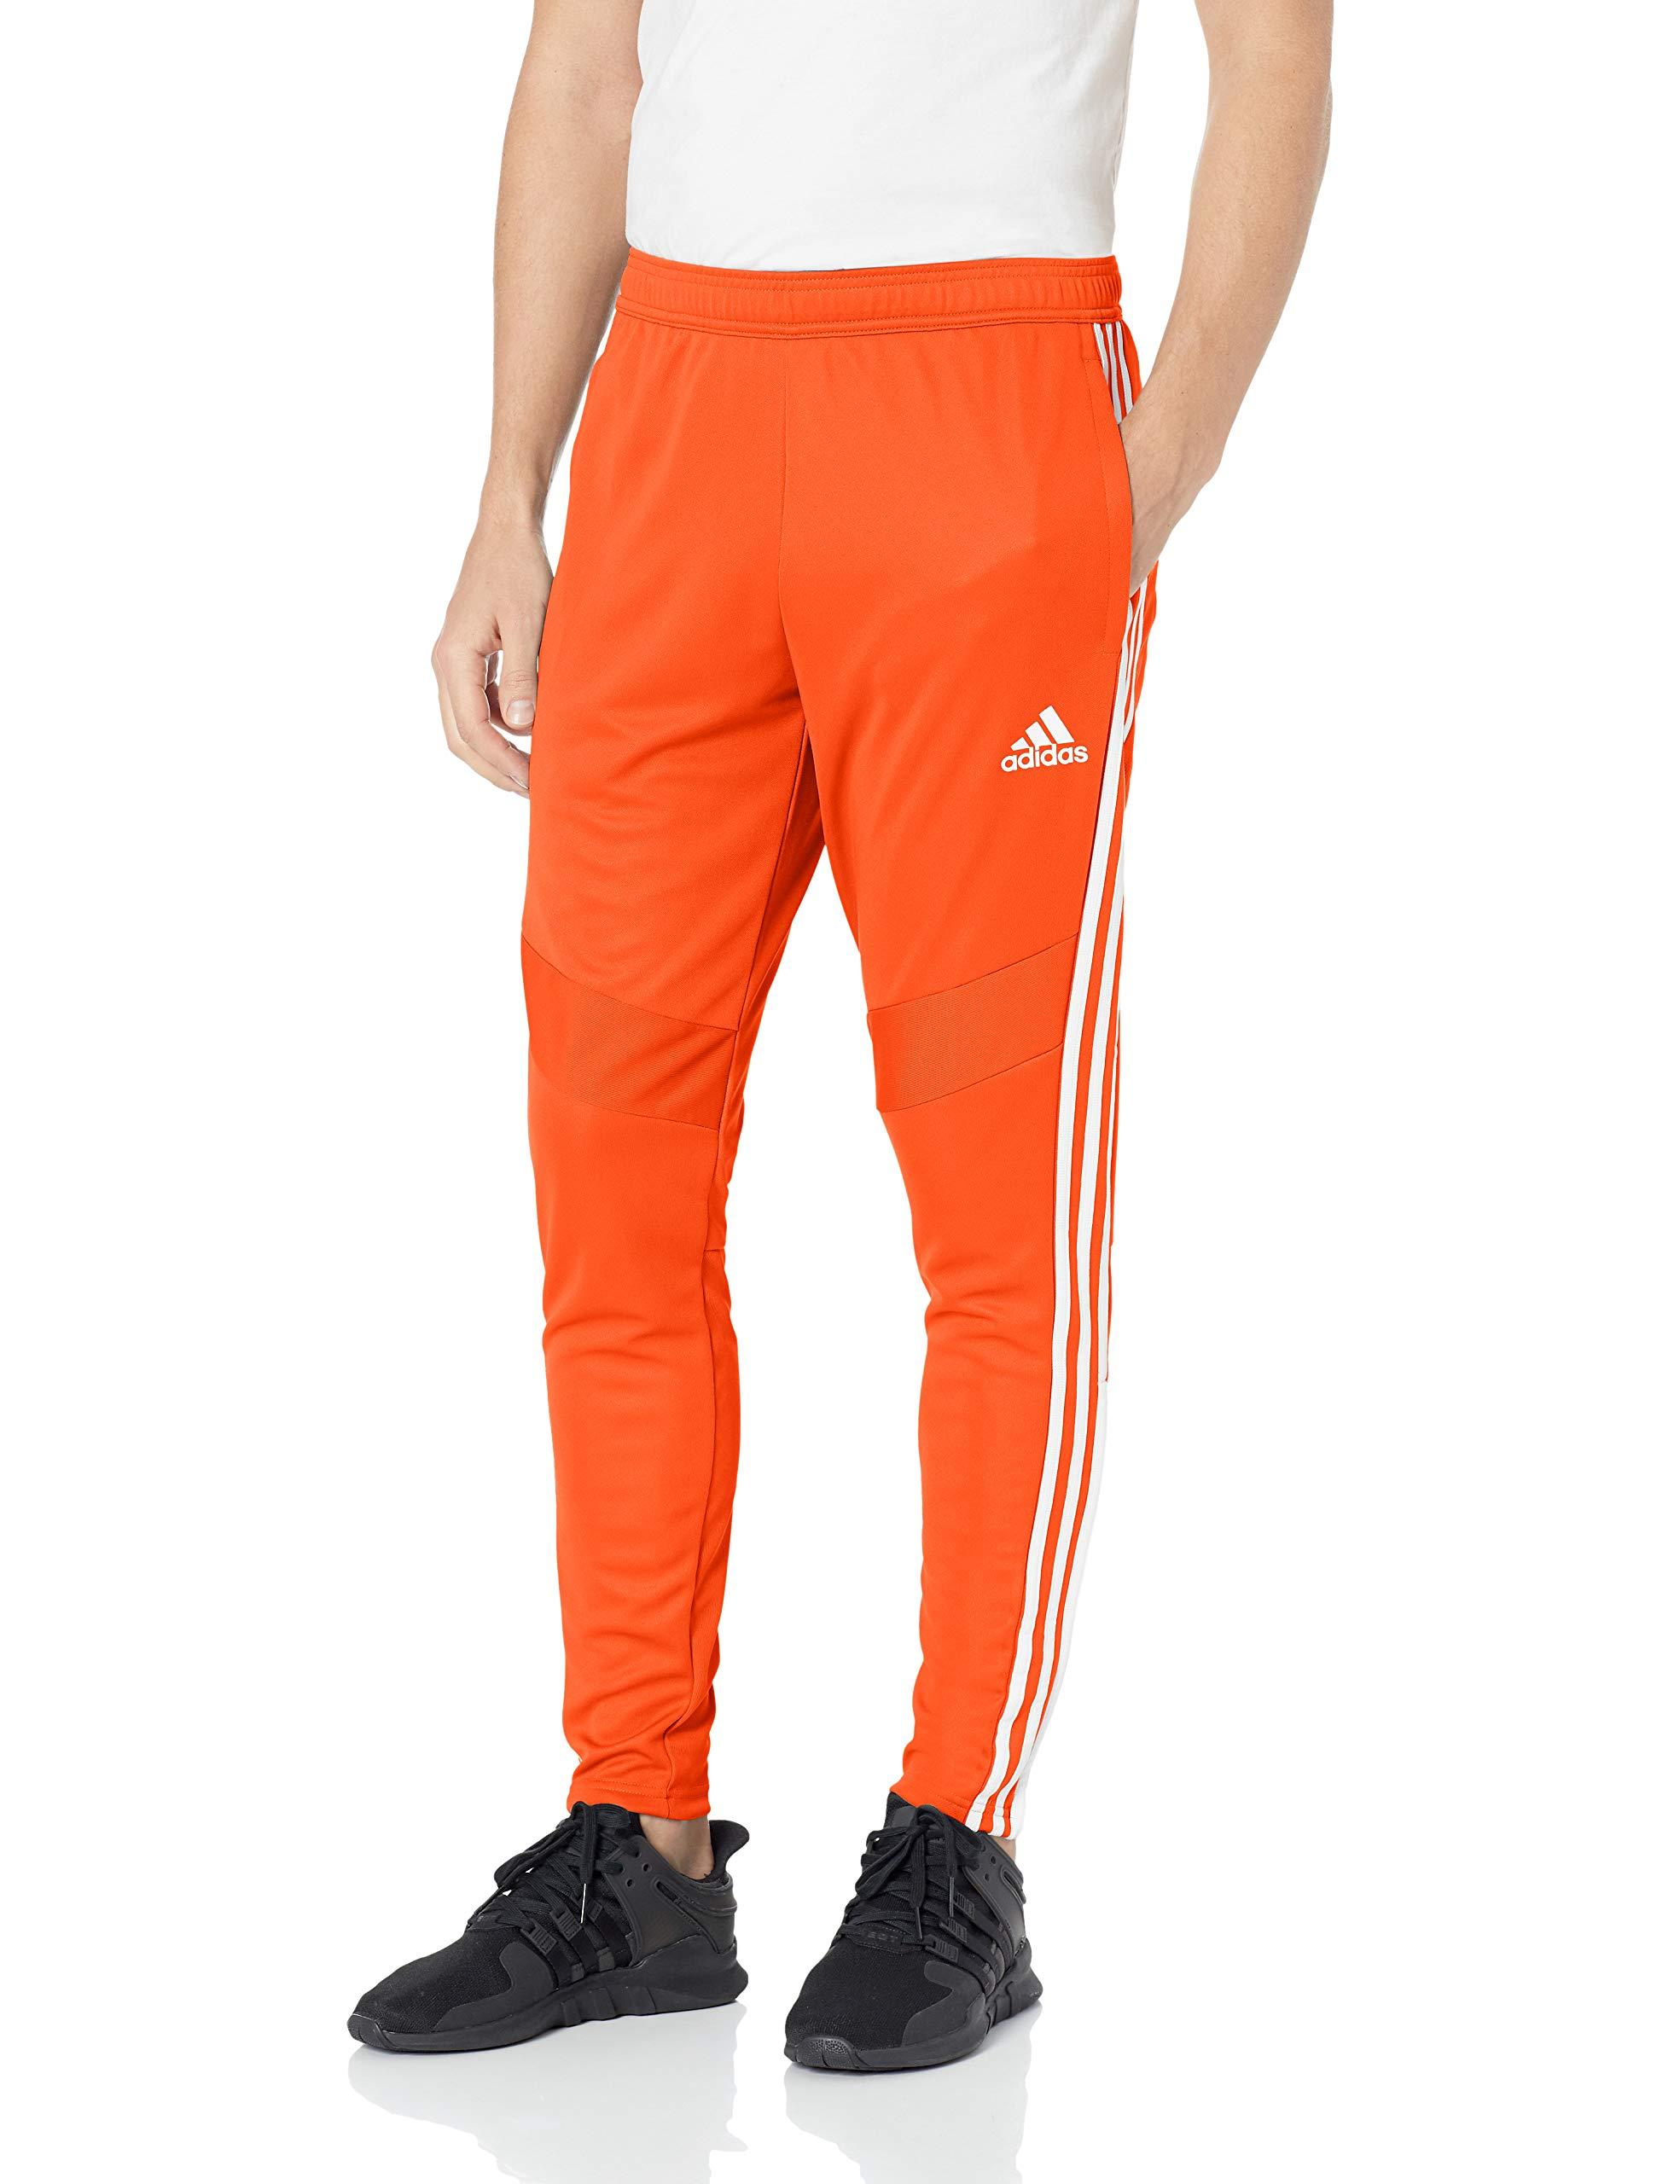 adidas Men's Tiro 19 Training Soccer Pants, Tiro